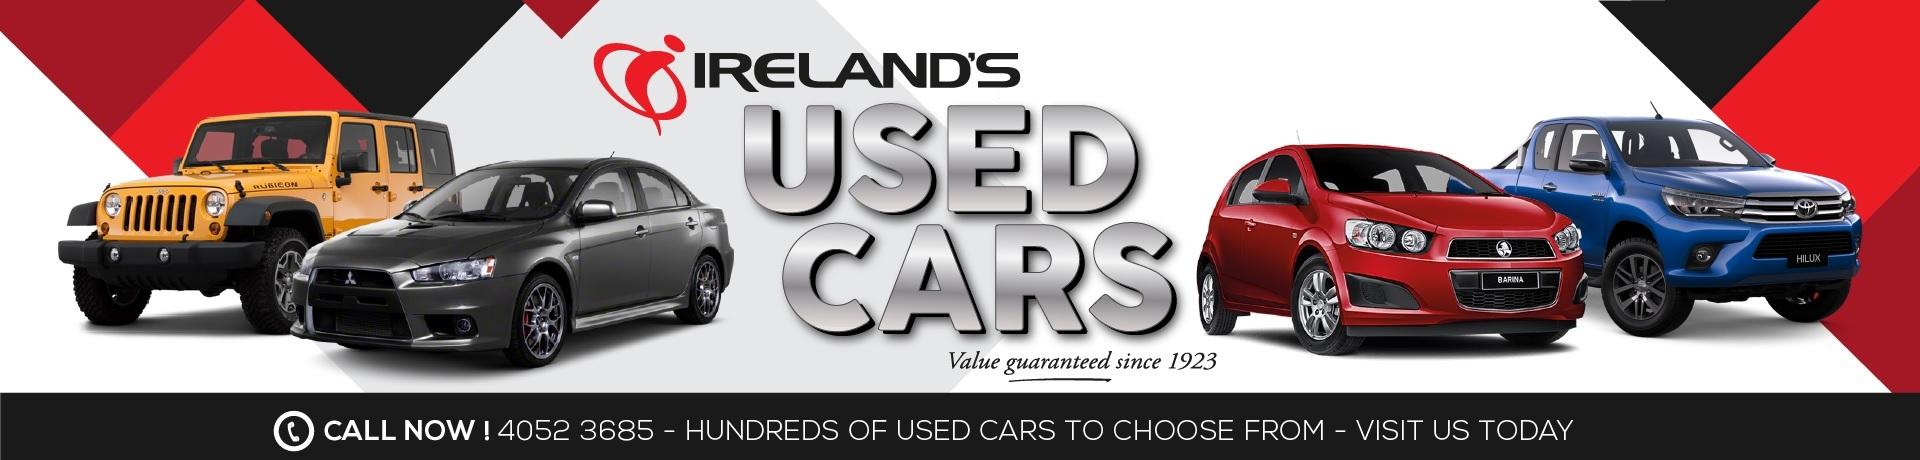 Ireland's Used Cars